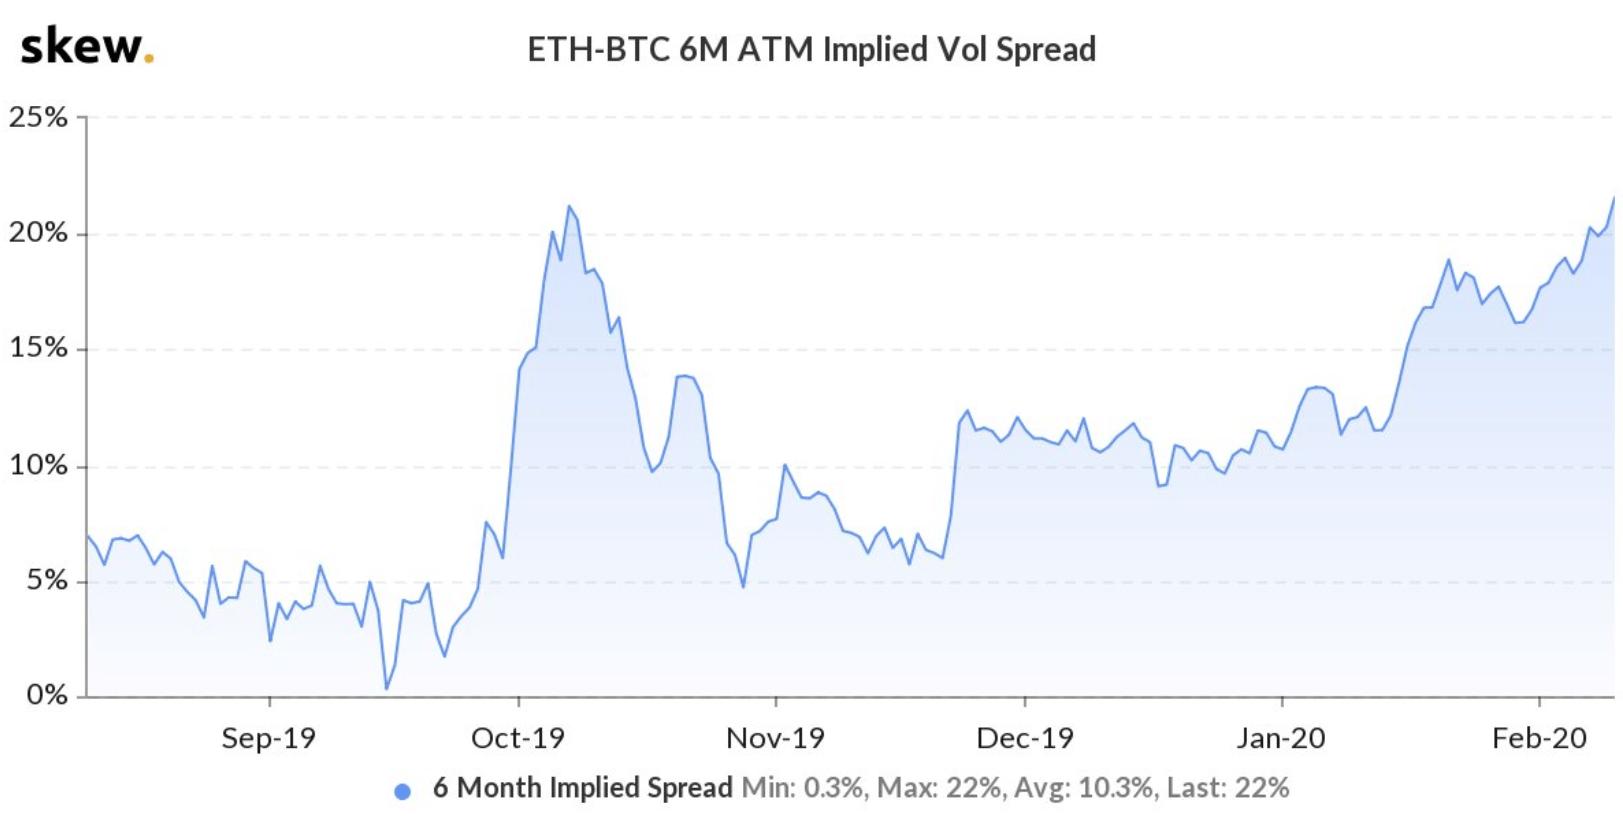 ethereum implied vol spread